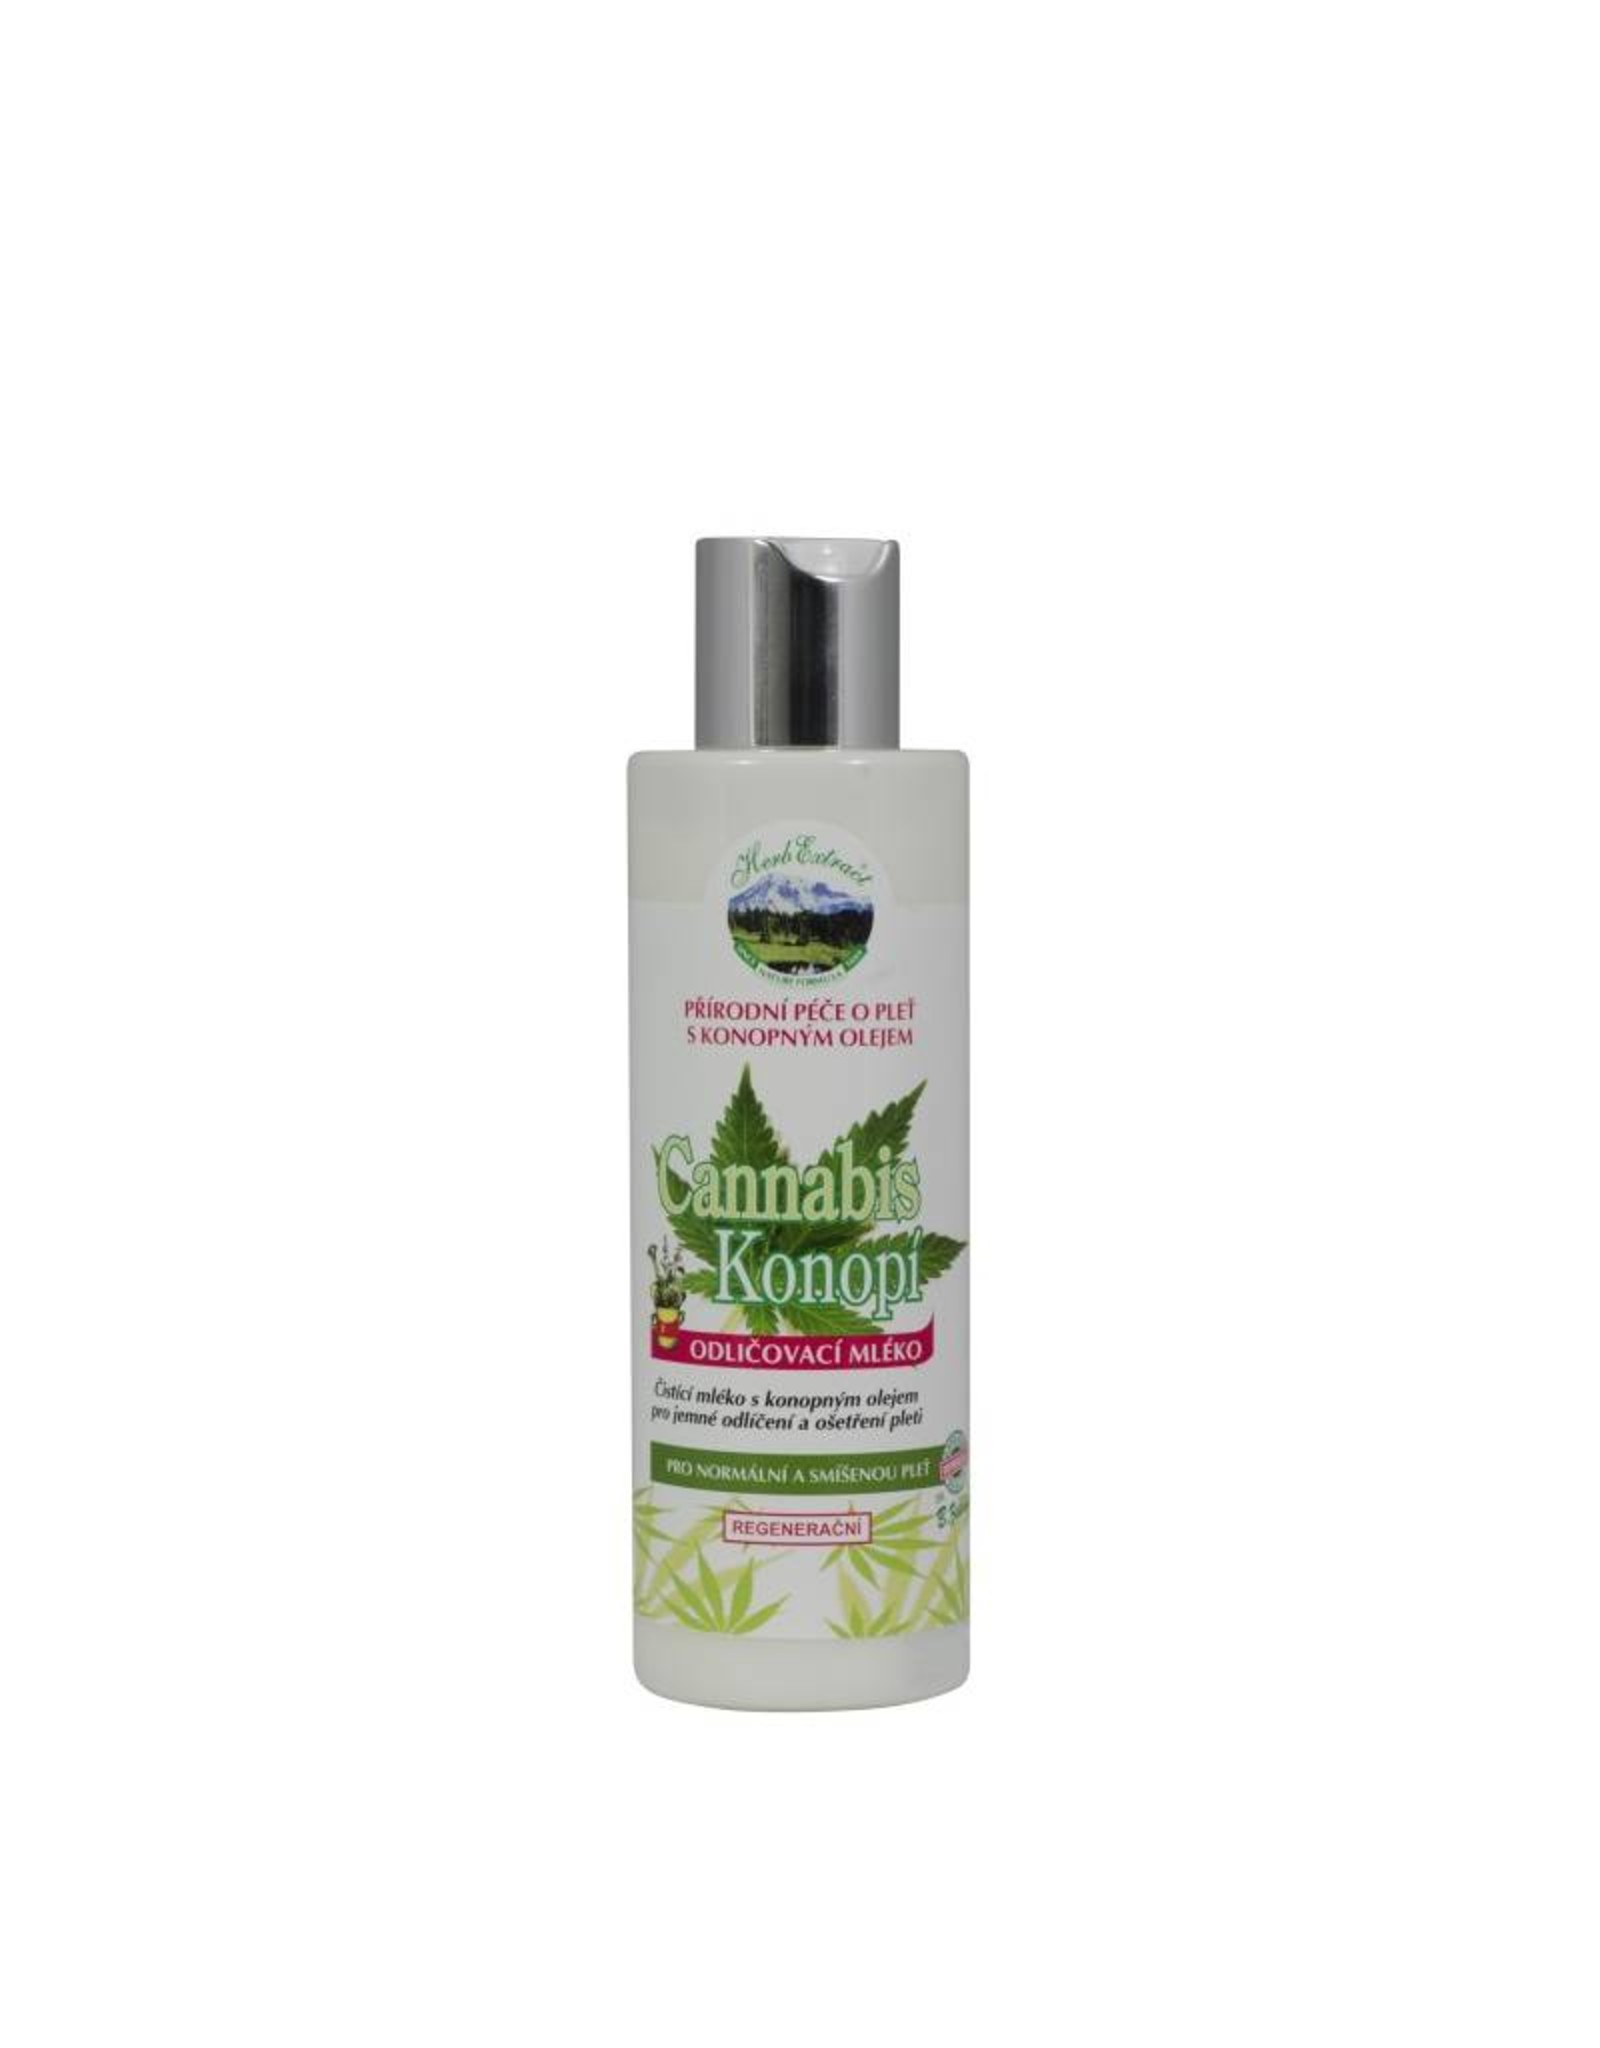 Herb Extract®  Facial Cleansing Milk met Cannabis olie